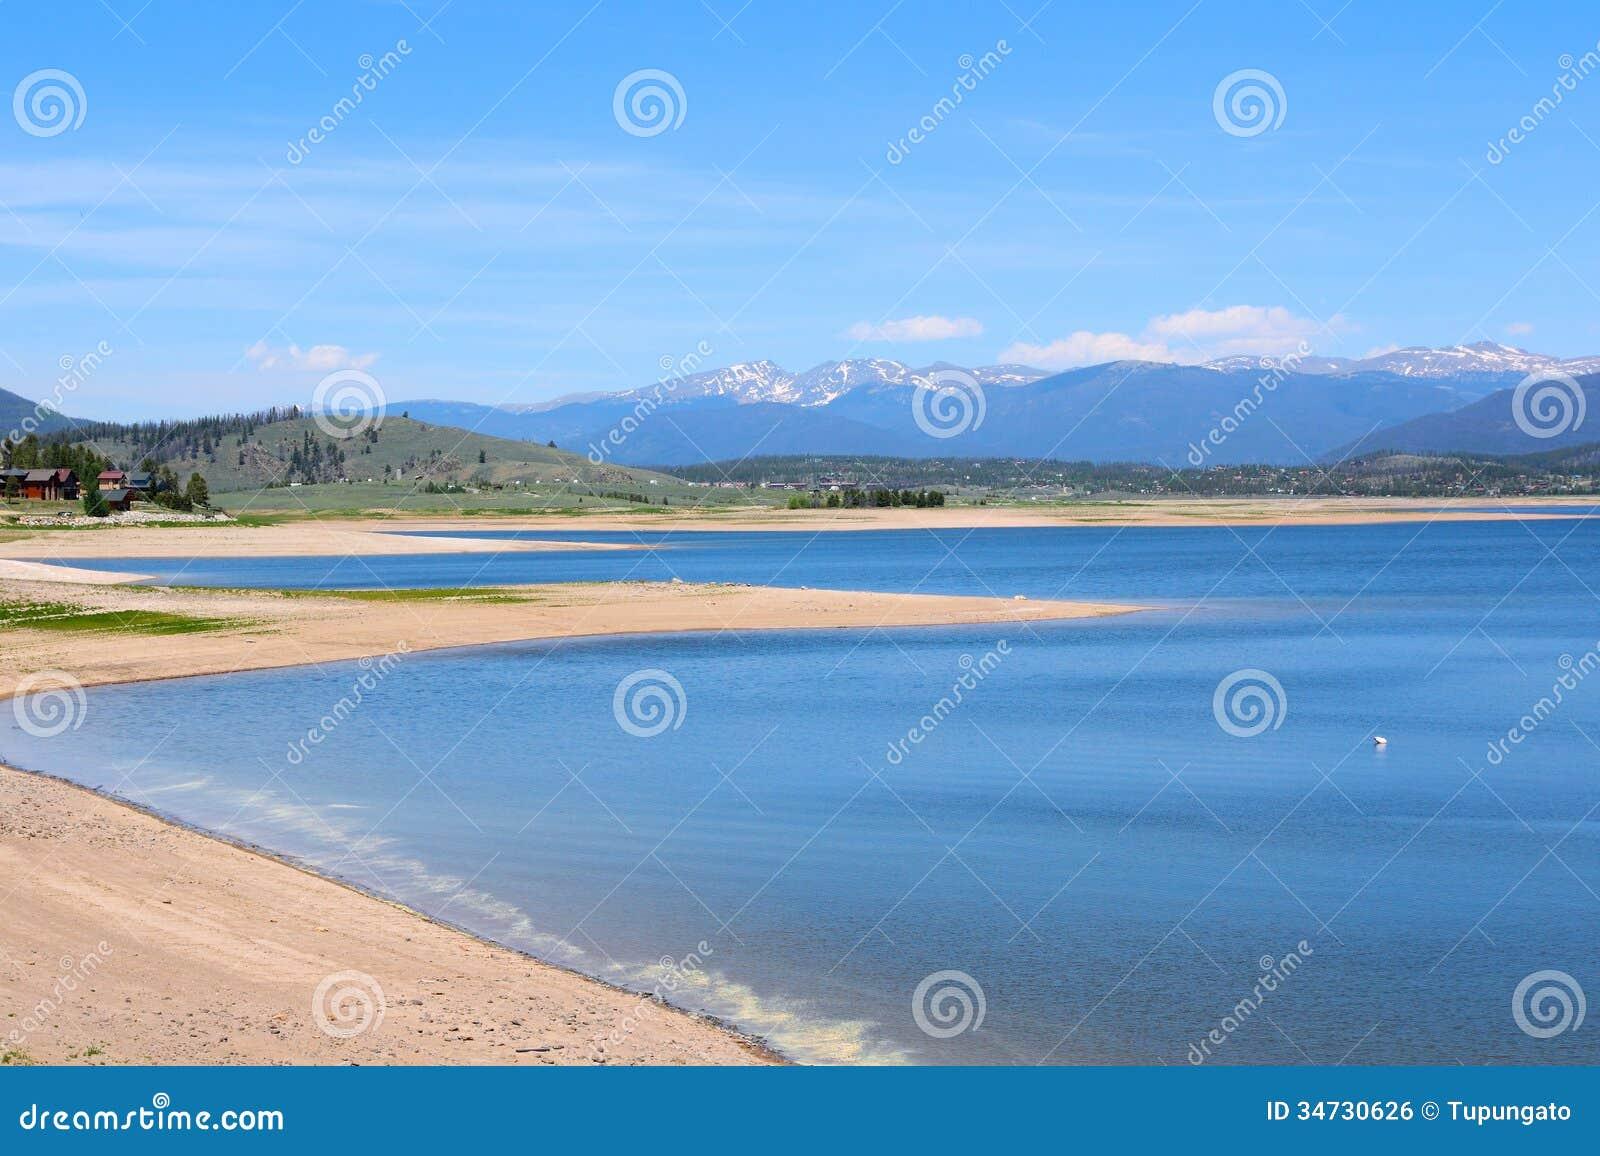 Lake granby colorado royalty free stock image image for Lake granby fishing report